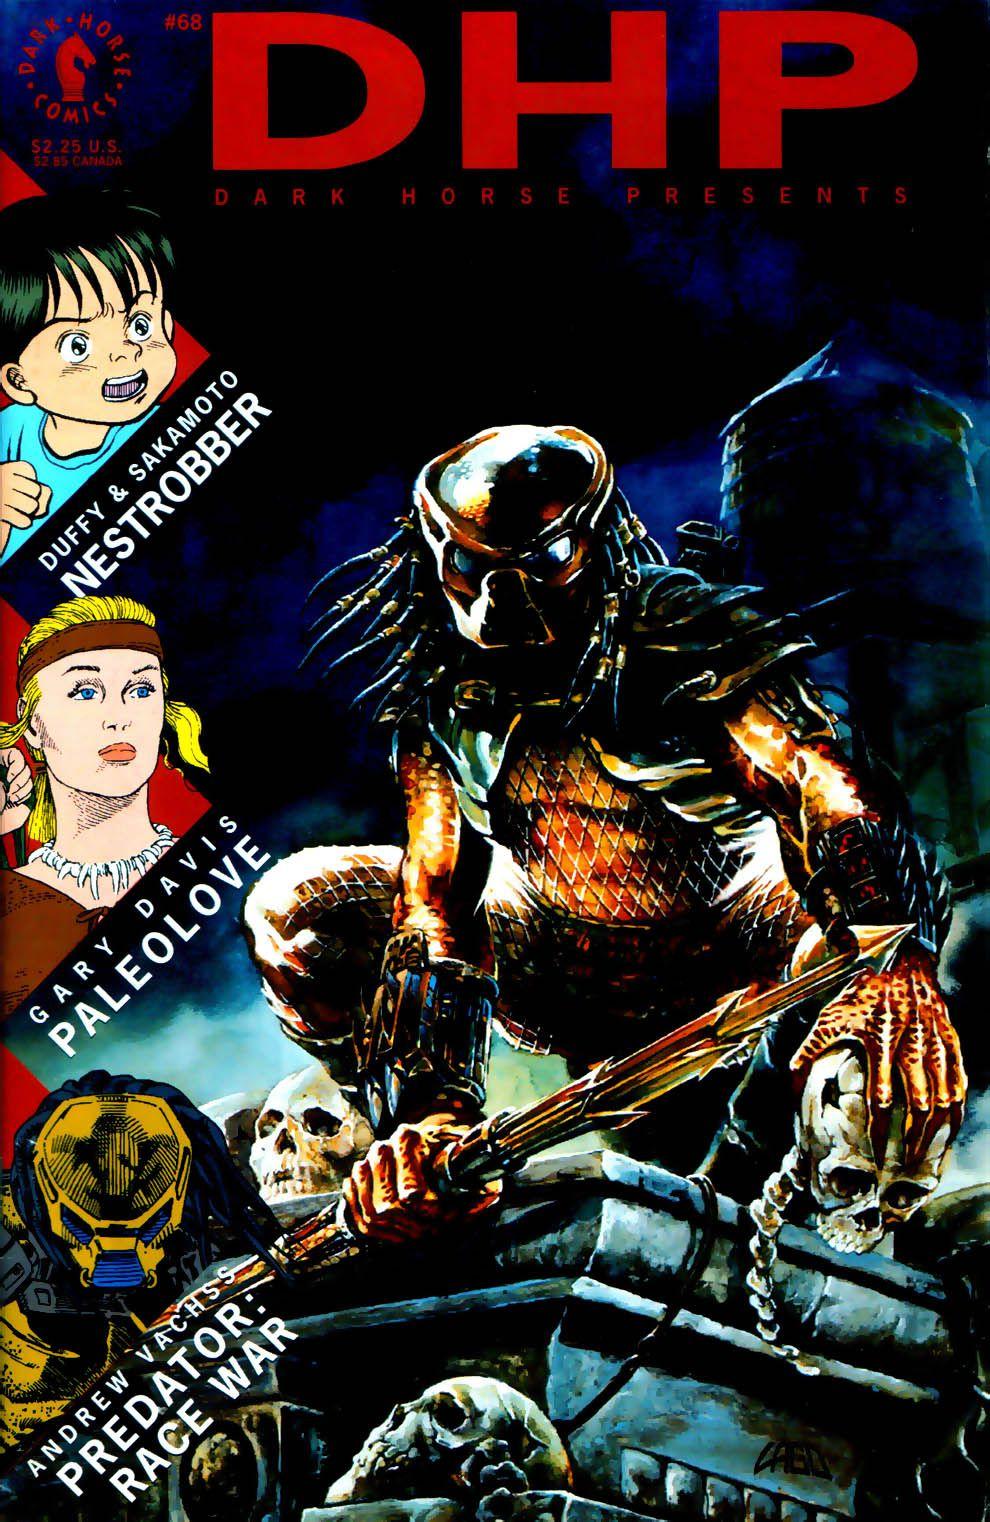 Dark Horse Presents vol 1 68 Cover art by Ray Lago